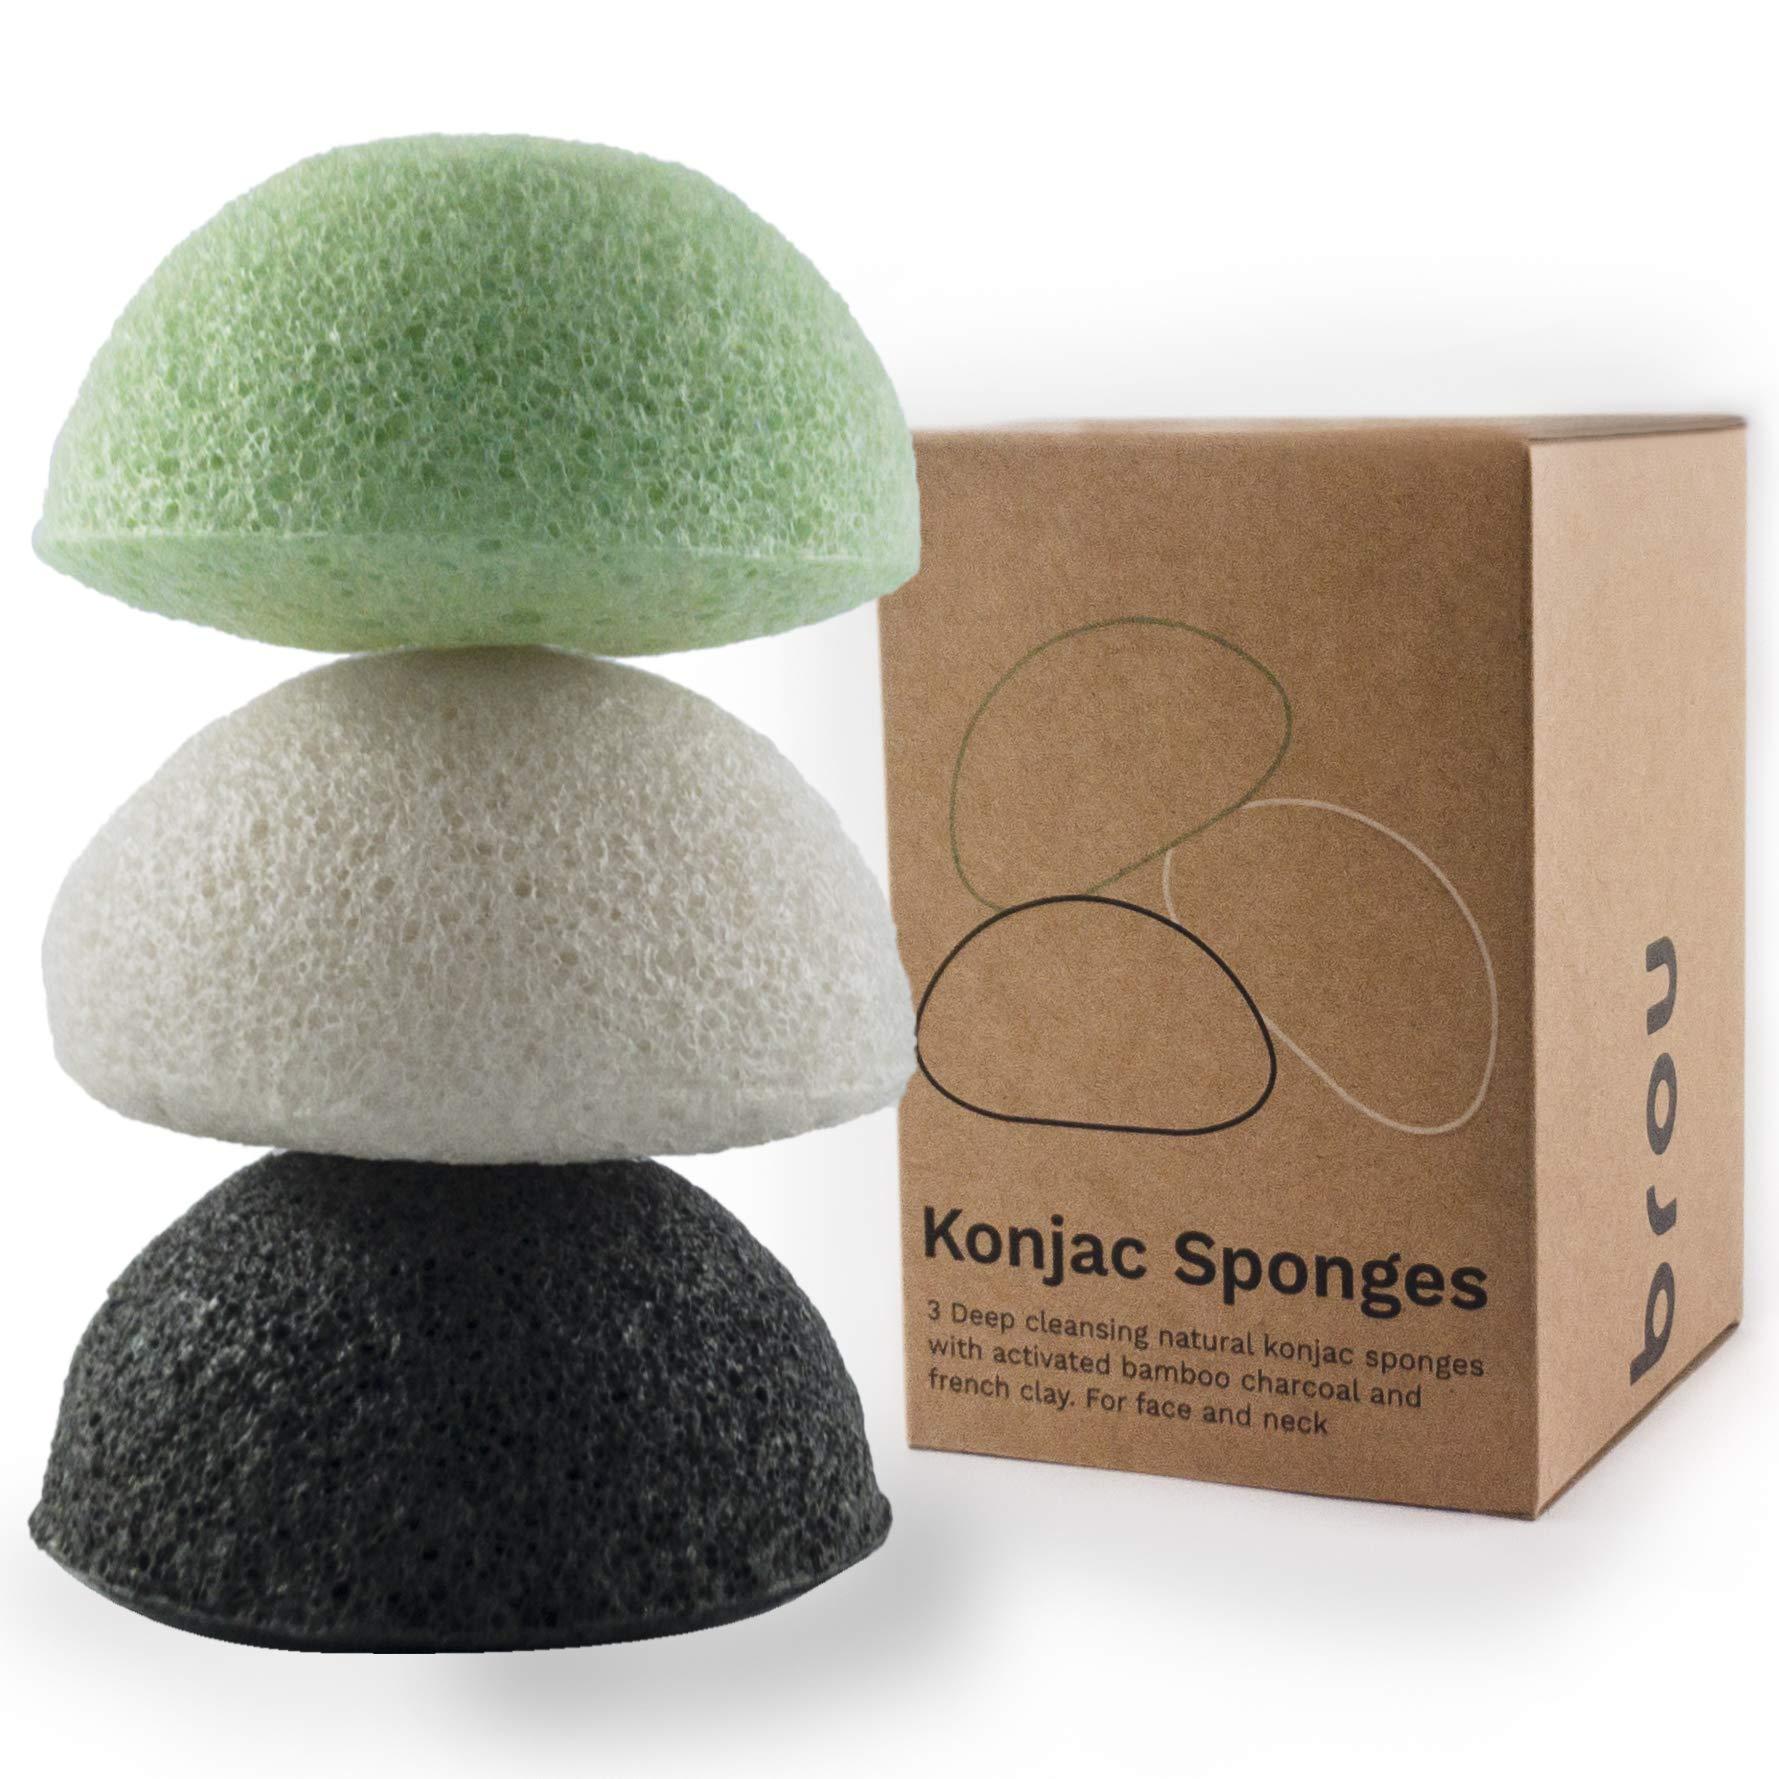 BROU | Premium Konjac Facial sponges | 3 pack | Organic | Biodegradable | Eco-friendly | Plastic-free |